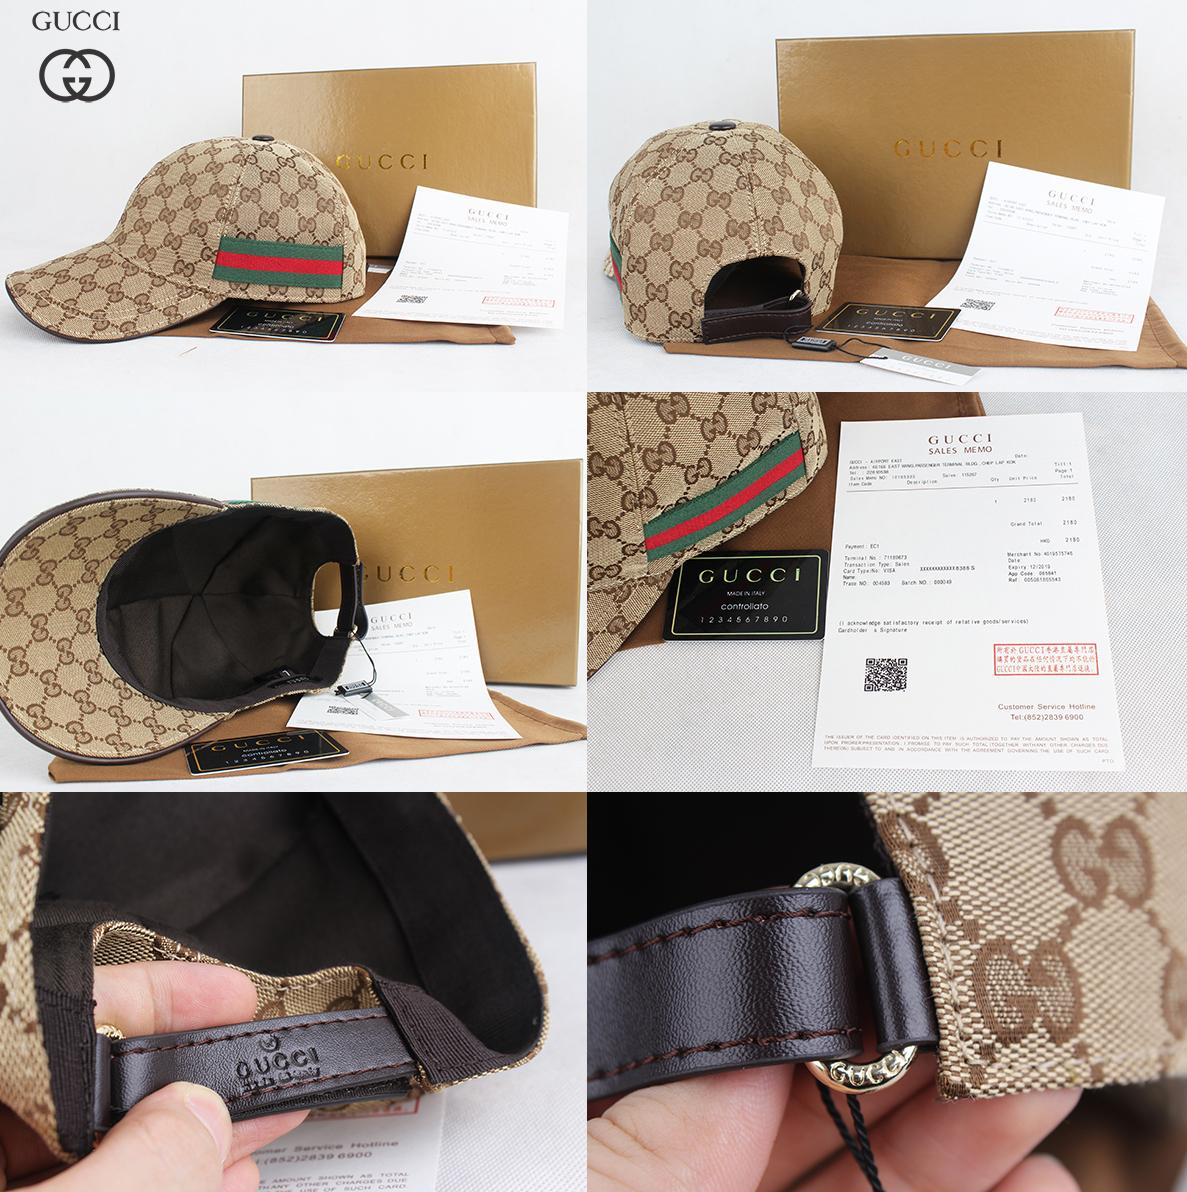 Topi Gucci Coffe Flag Mirror topi pria wanita / Original / Best Quality / Limited Edition